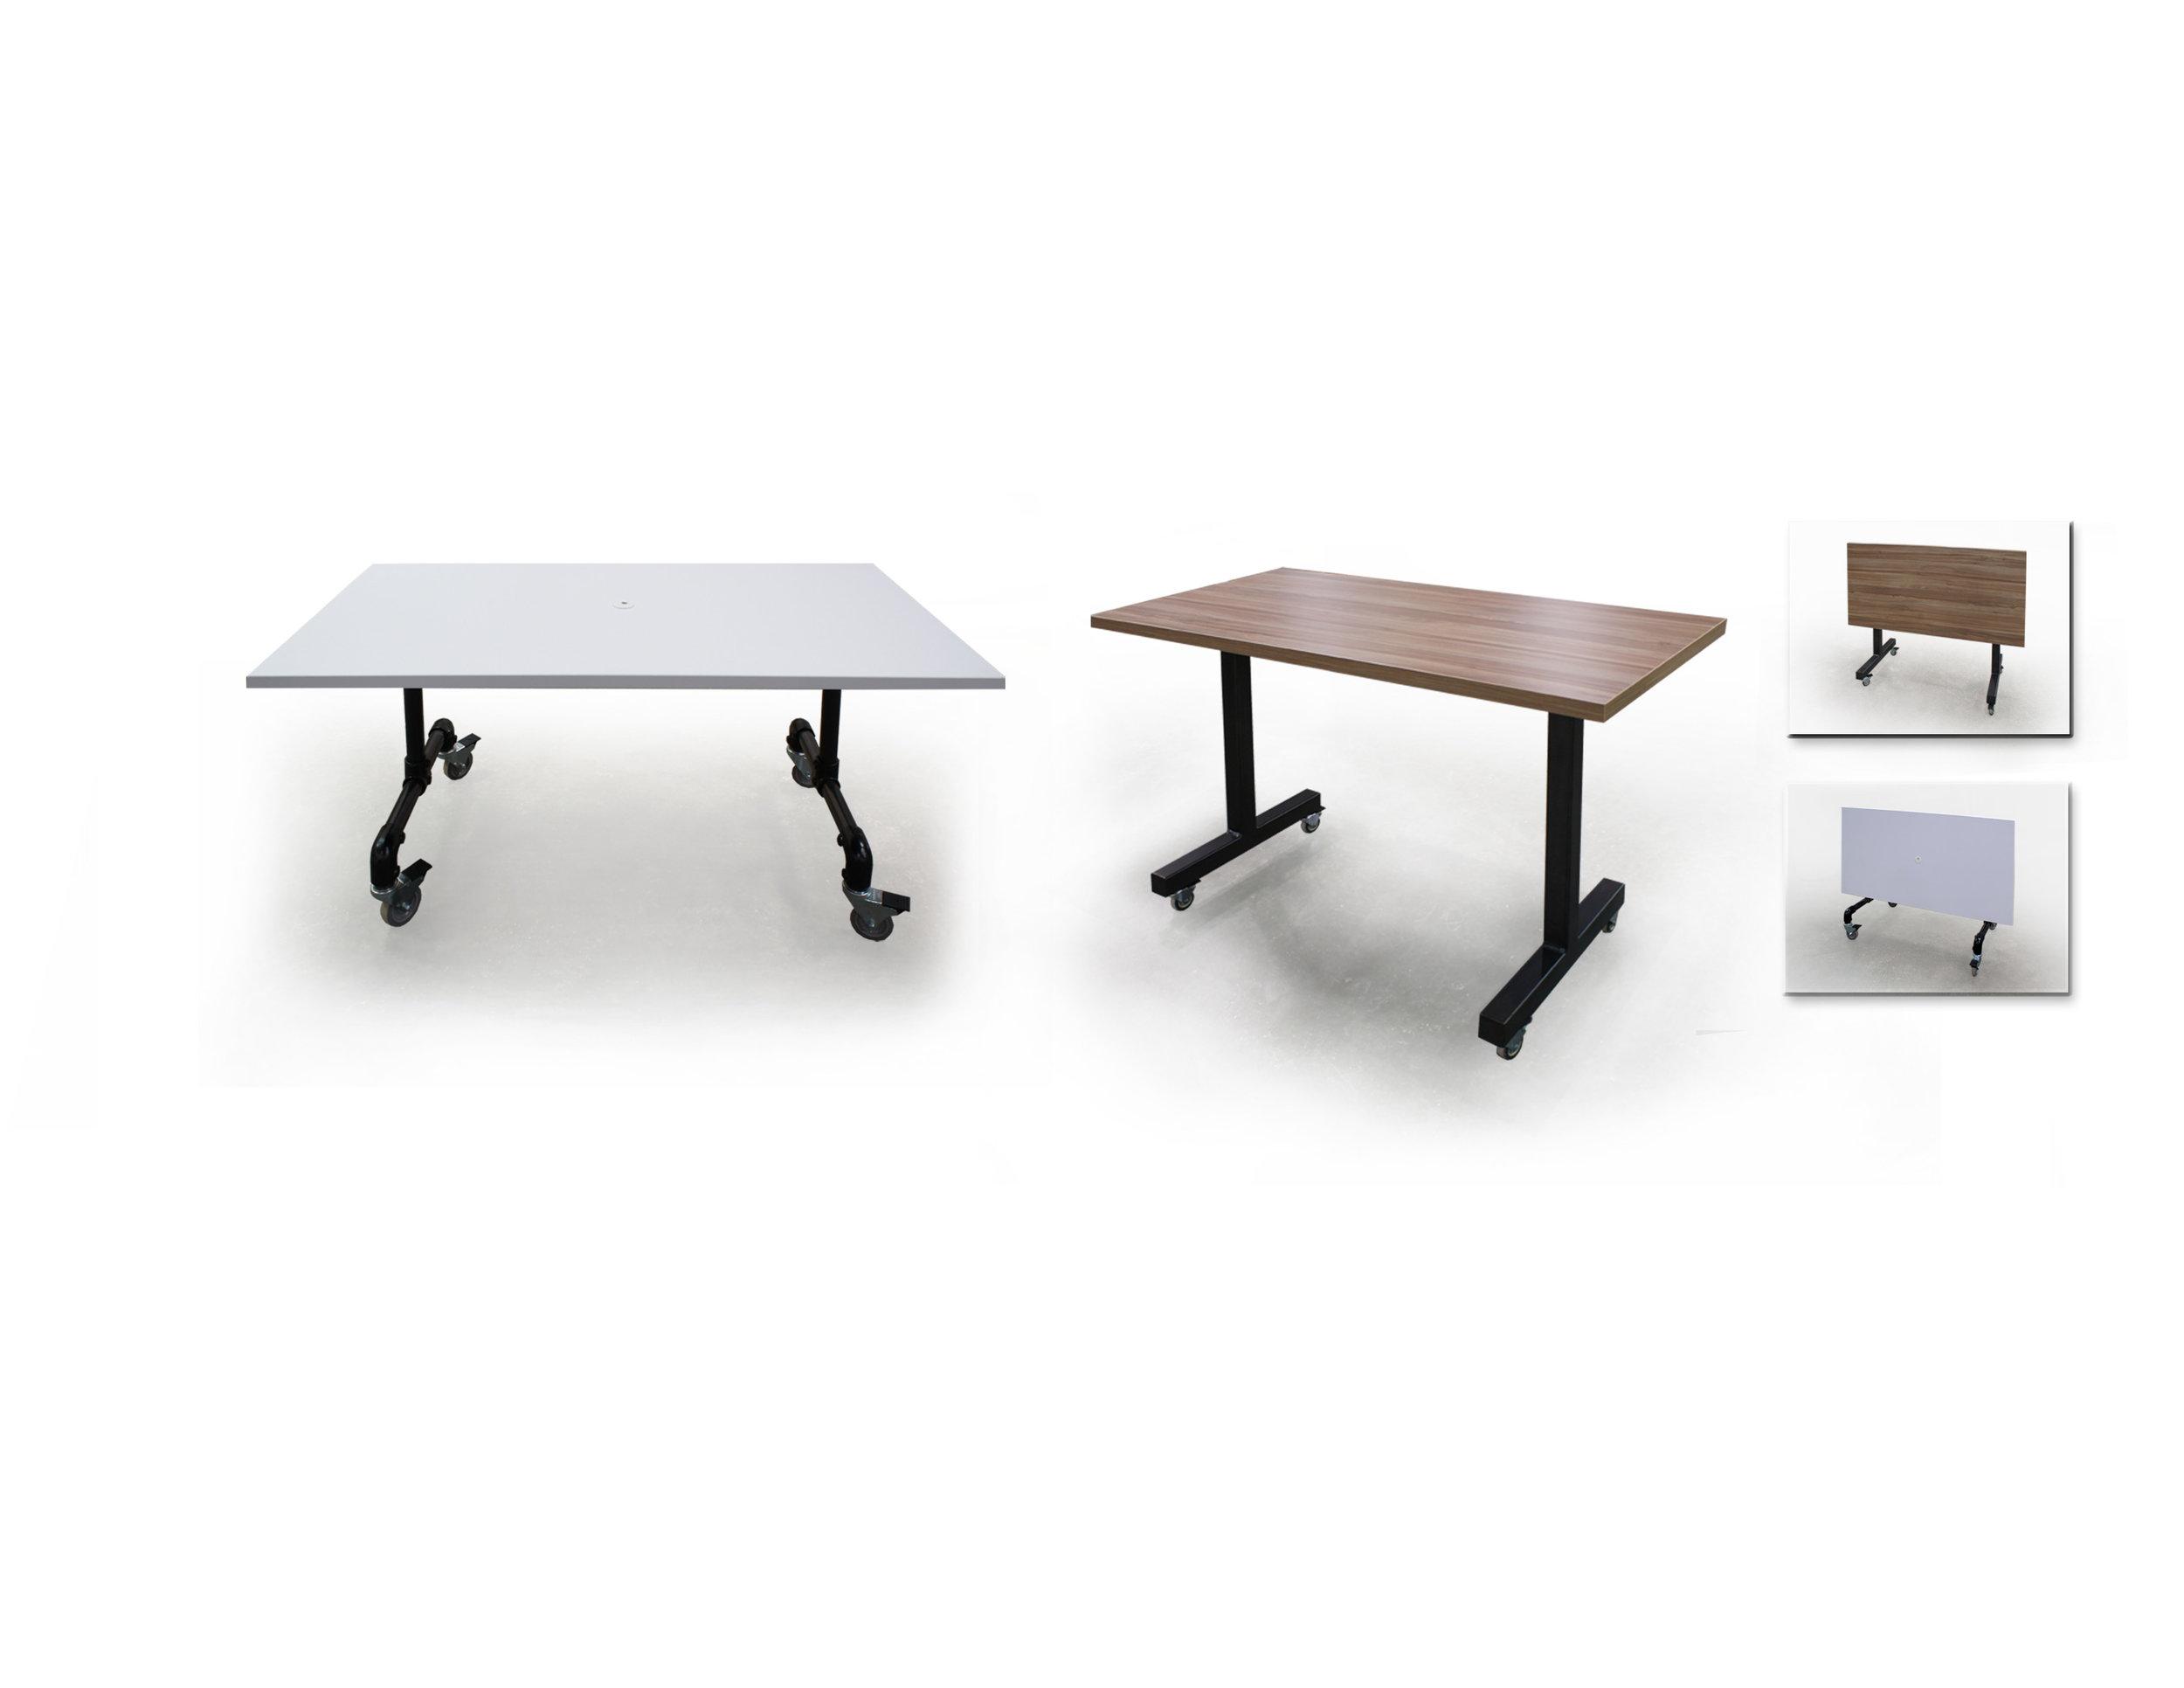 flip-top training tables - (l) white p-lam (r) walnut p-lam